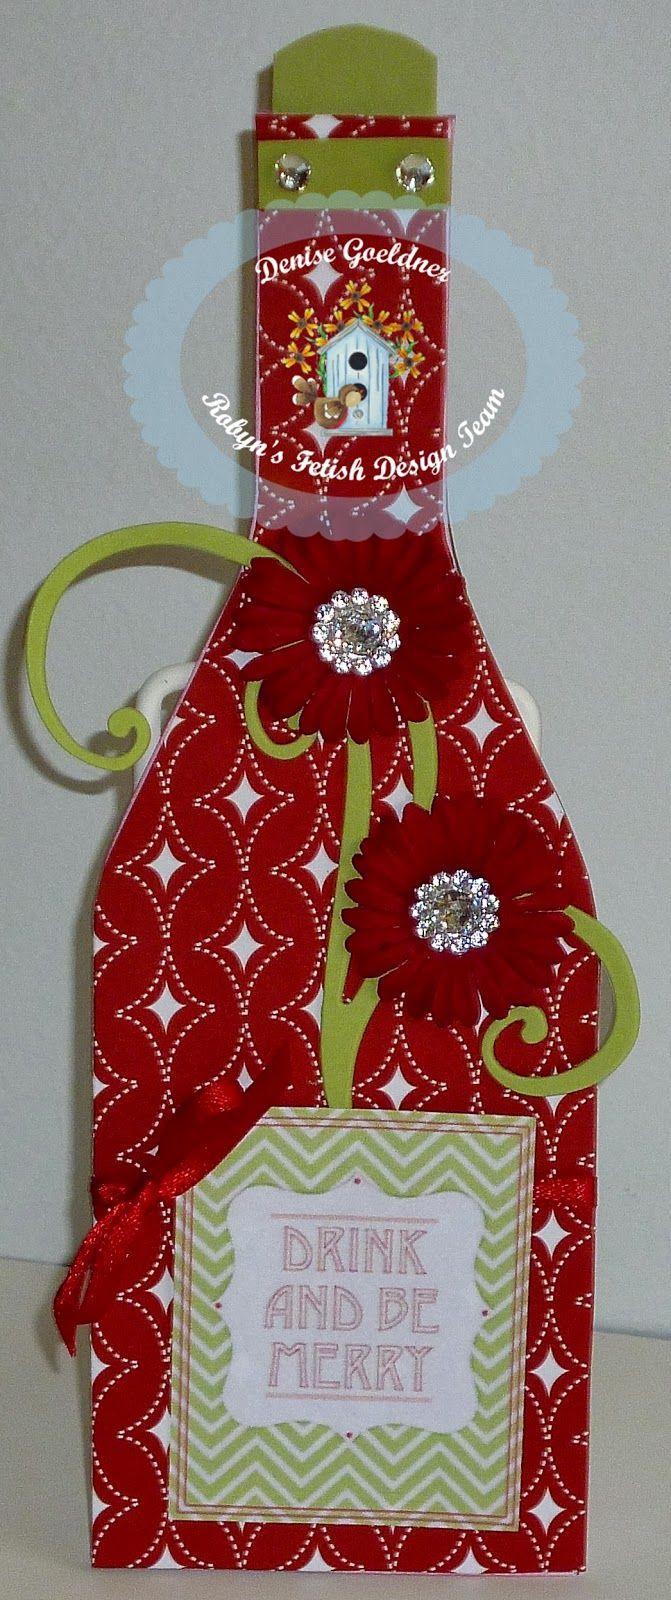 wine bottle shaped card | cutting cafe ideas | pinterest